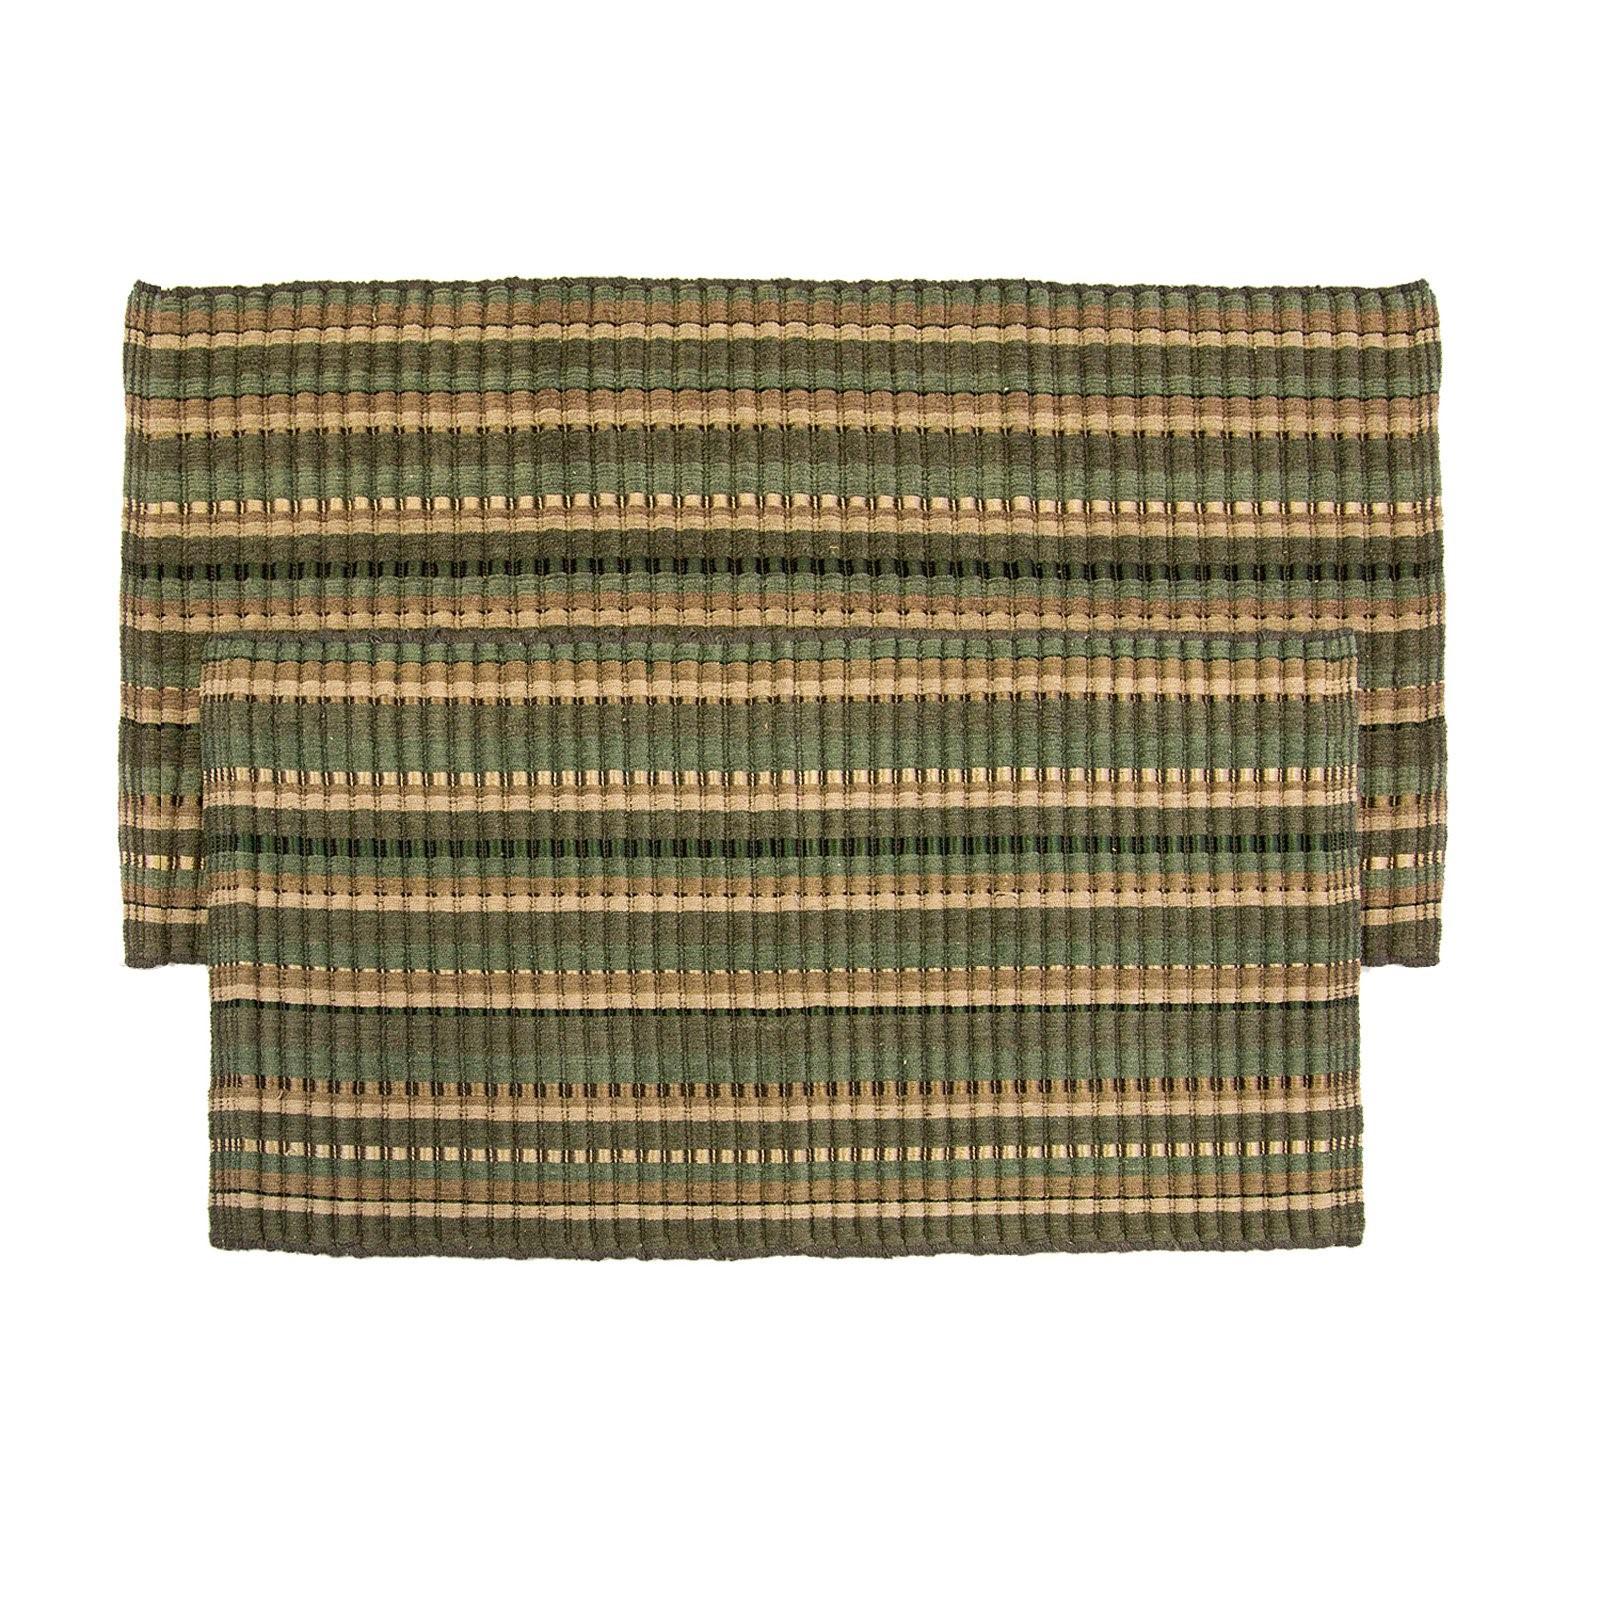 Home Weavers Inc. Silk Ribbed Hand-Woven Rug - Set of 2